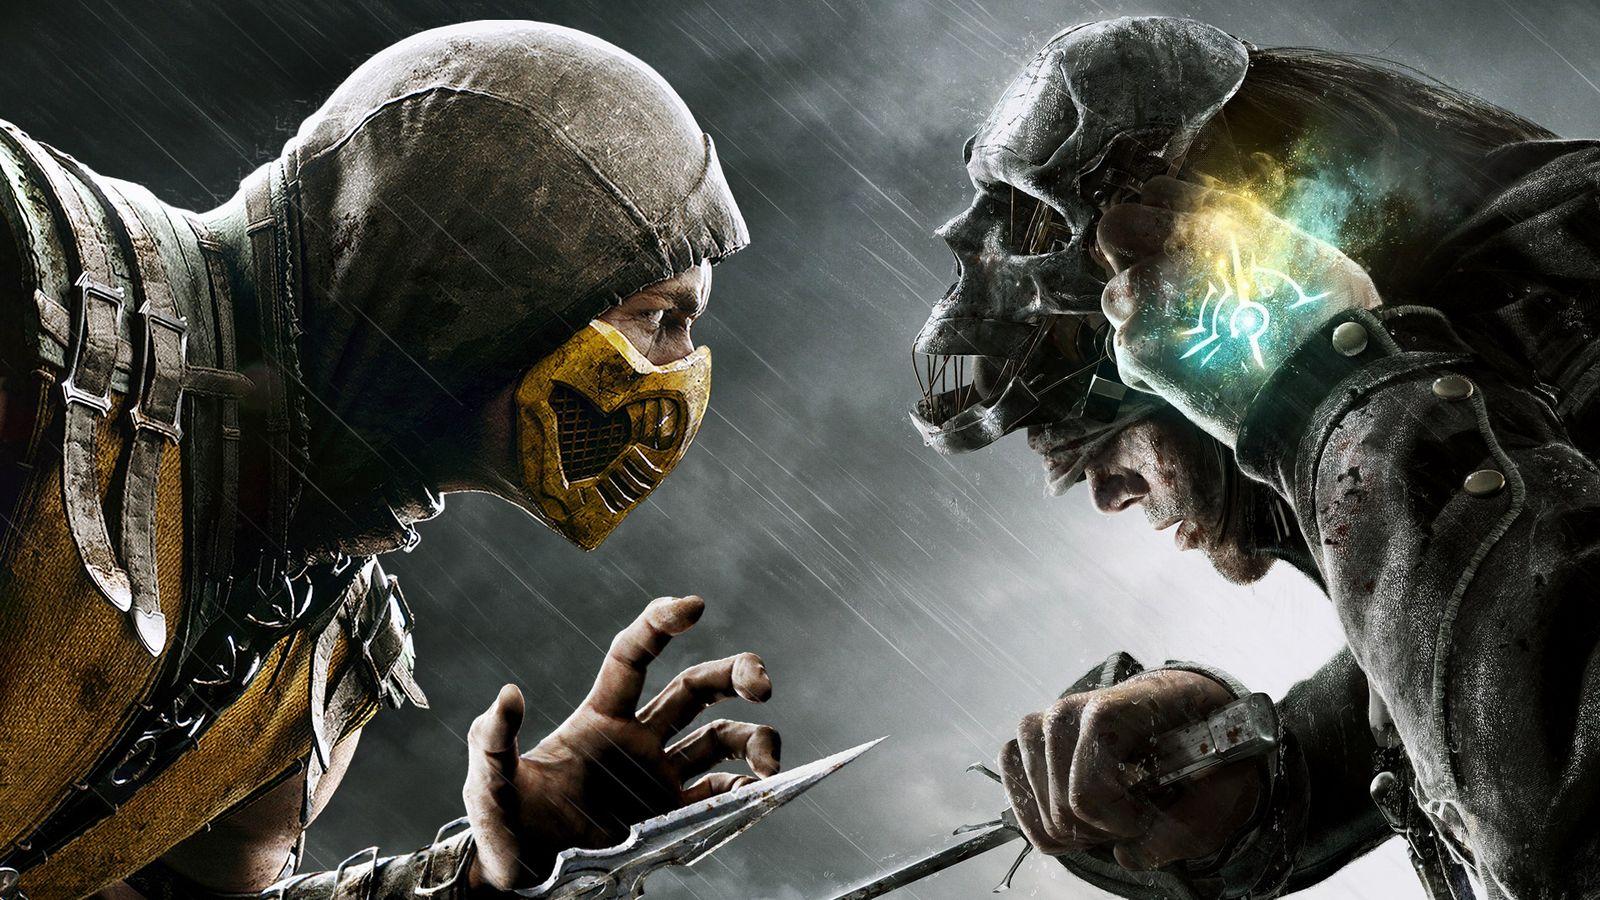 54 Scorpion Mortal Kombat Hd Wallpapers: Mortal Kombat Scorpion Wallpaper